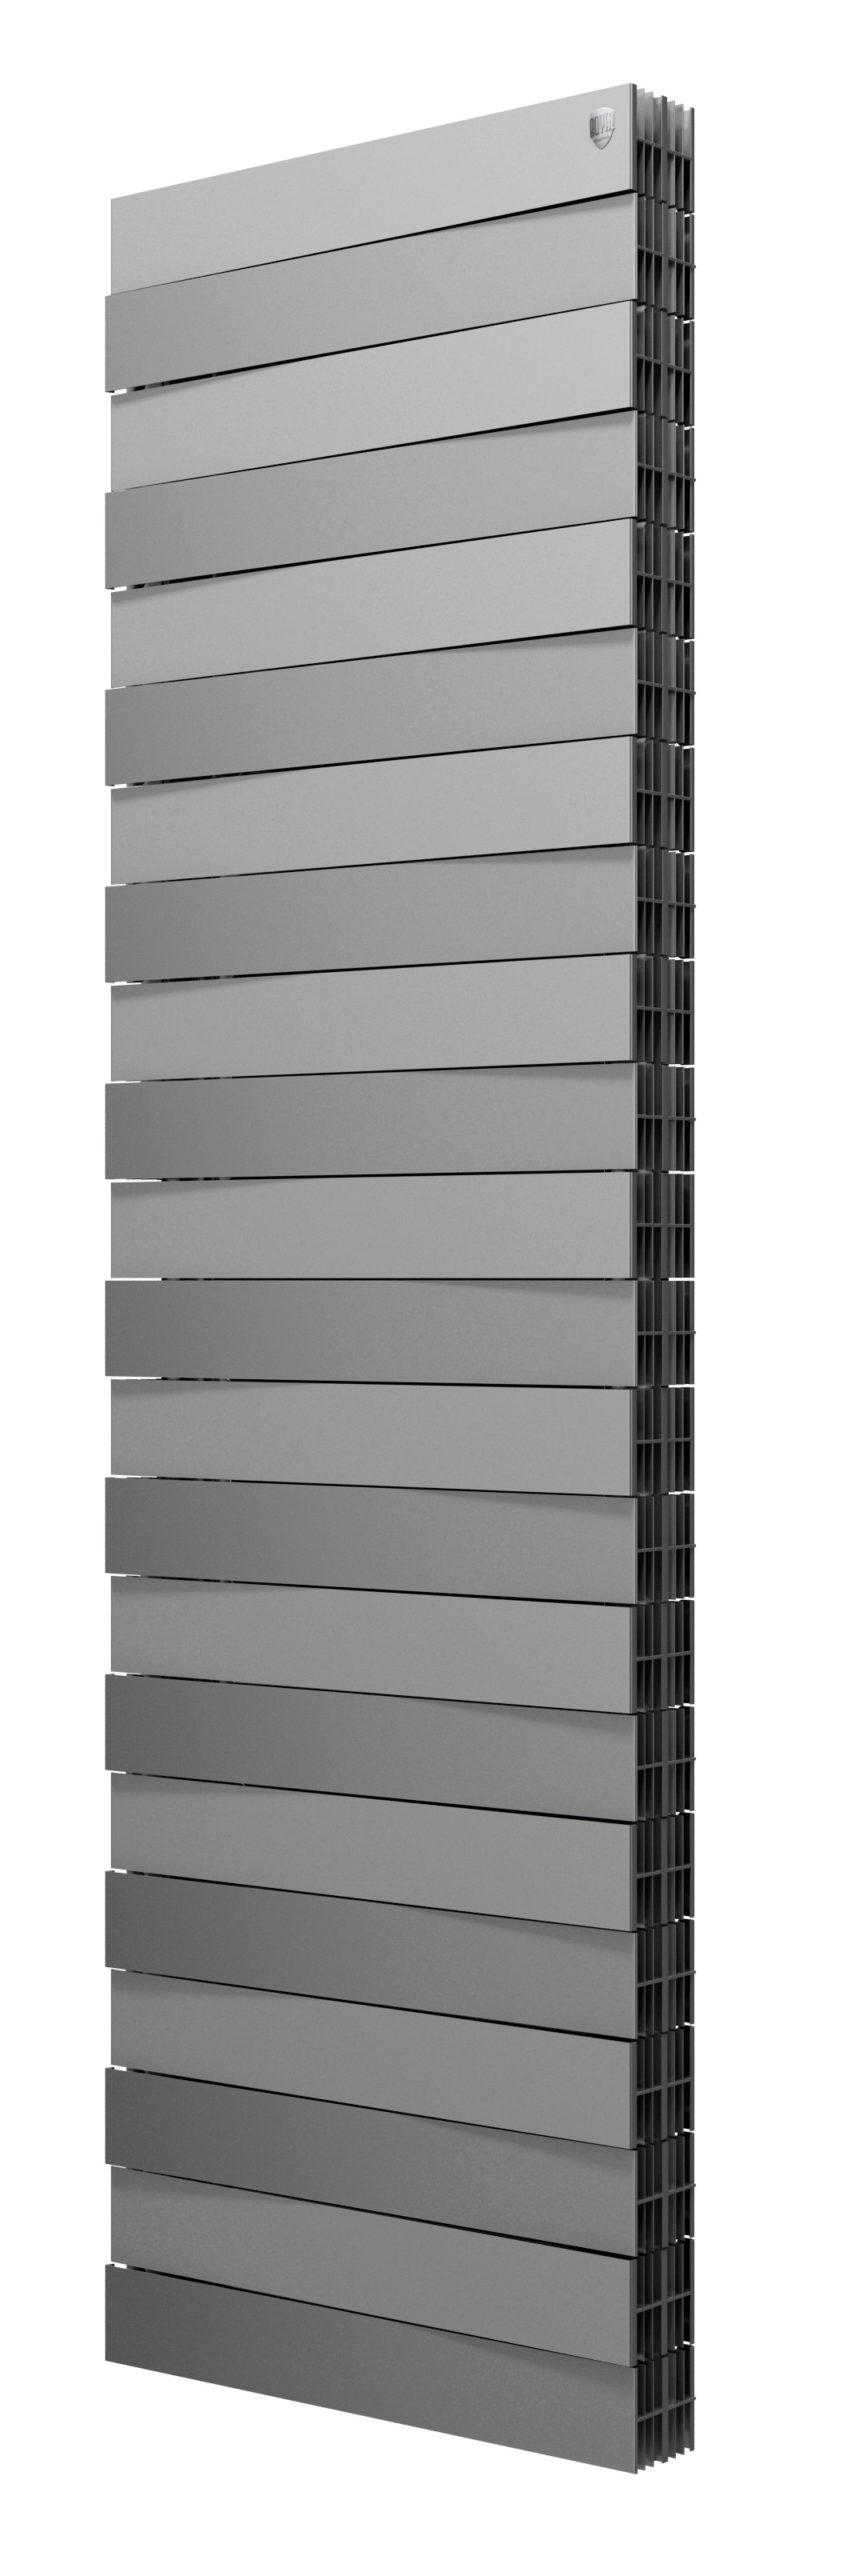 Биметаллические радиаторы Piano Forte Tower фото 2